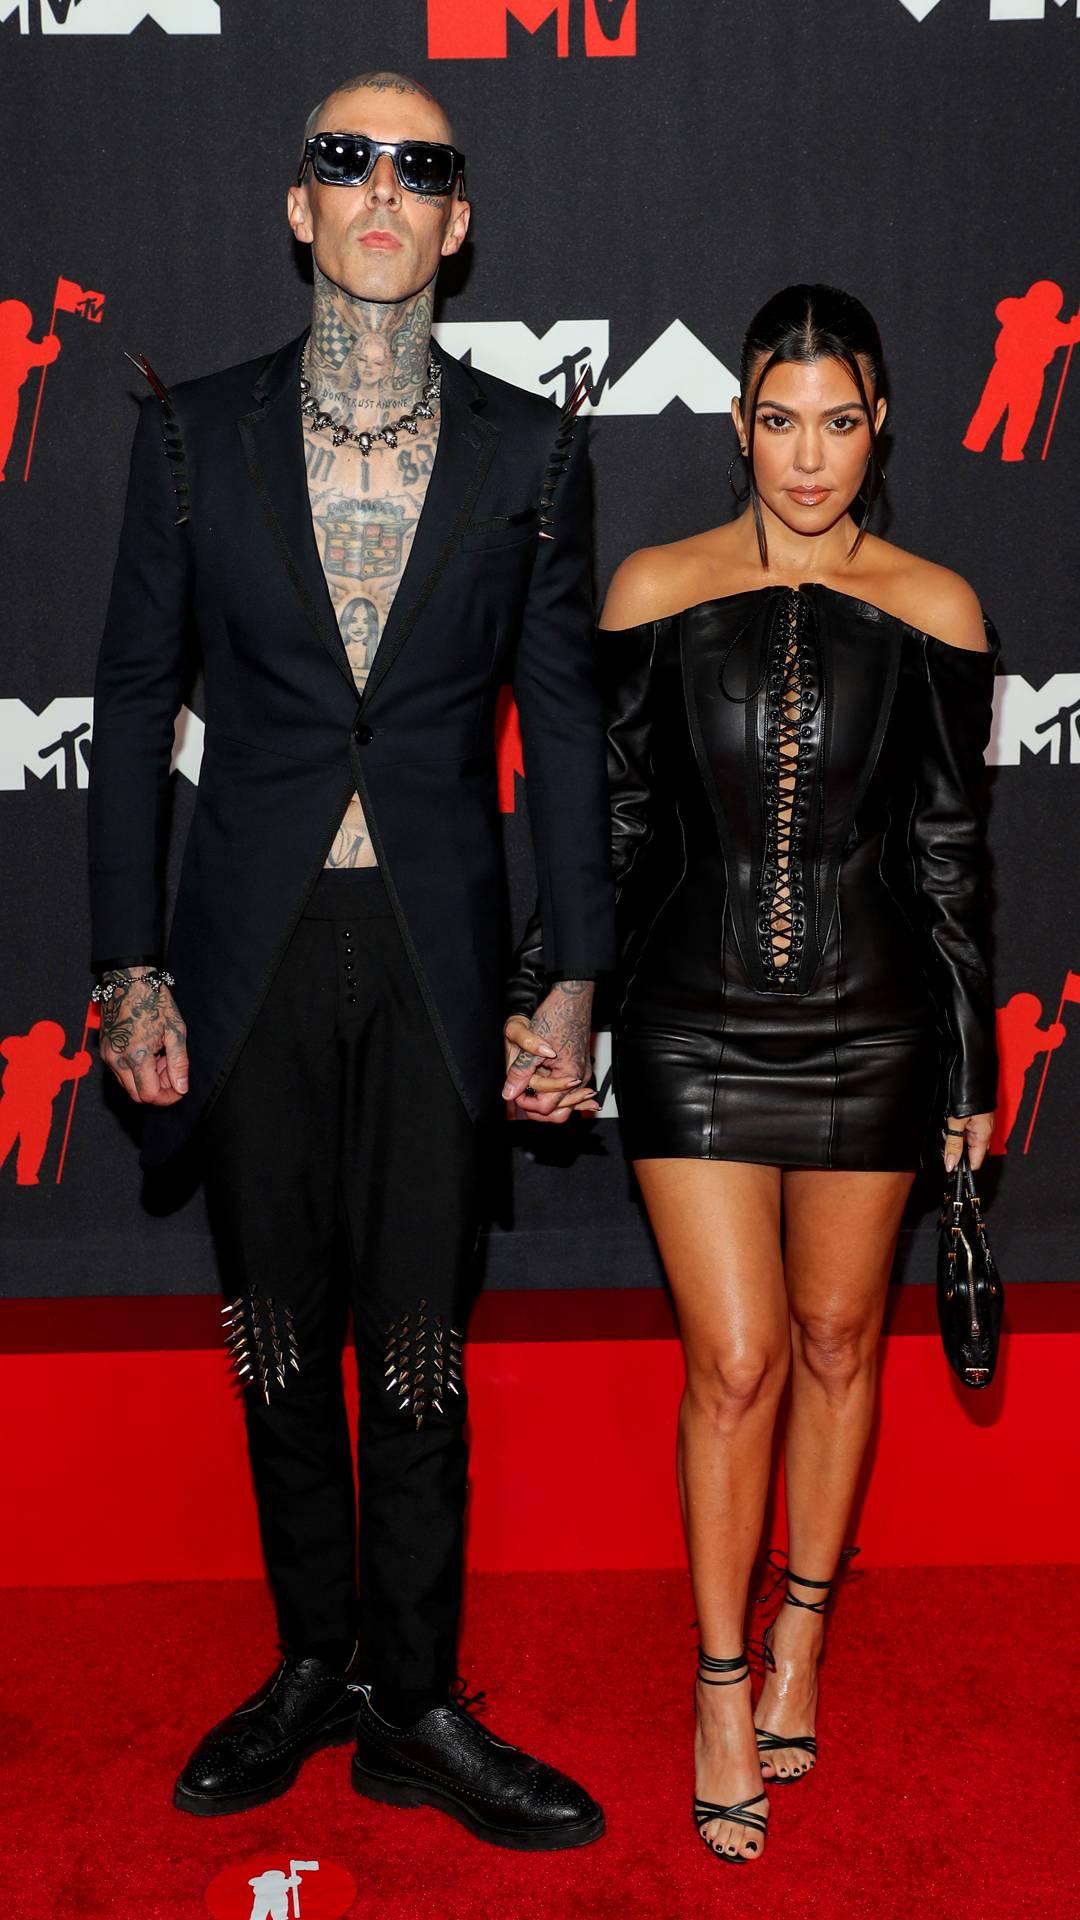 MTV Video Music Awards 2021 | The Best of the VMAs 2021 Red Carpet | Travis Barker and Kourtney Kardashian | 1080x1920